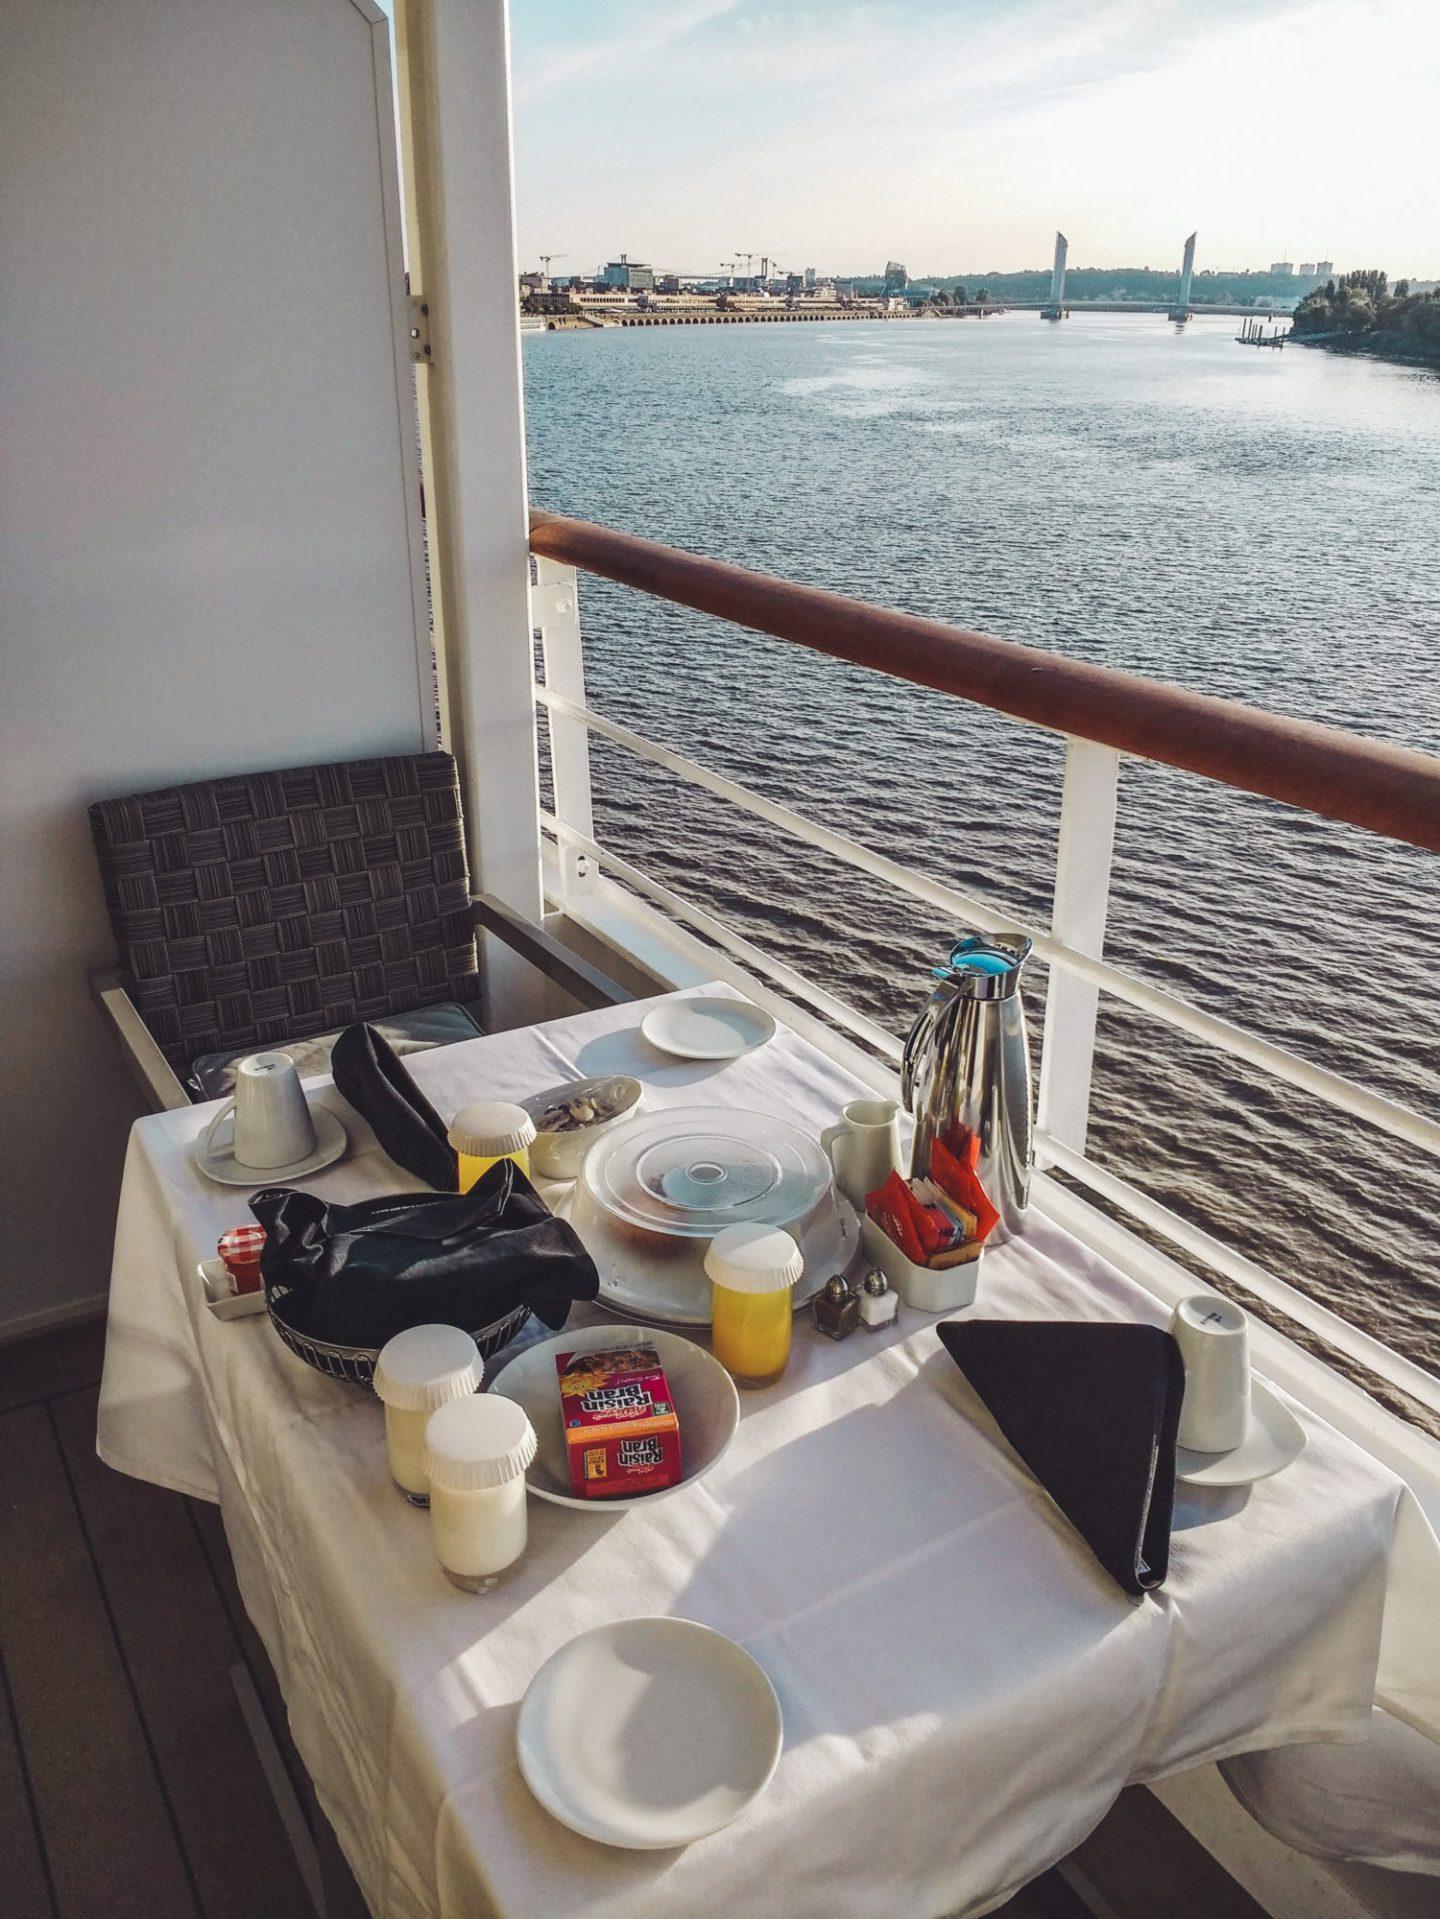 Azamara Pursuit - breakfast on the balcony